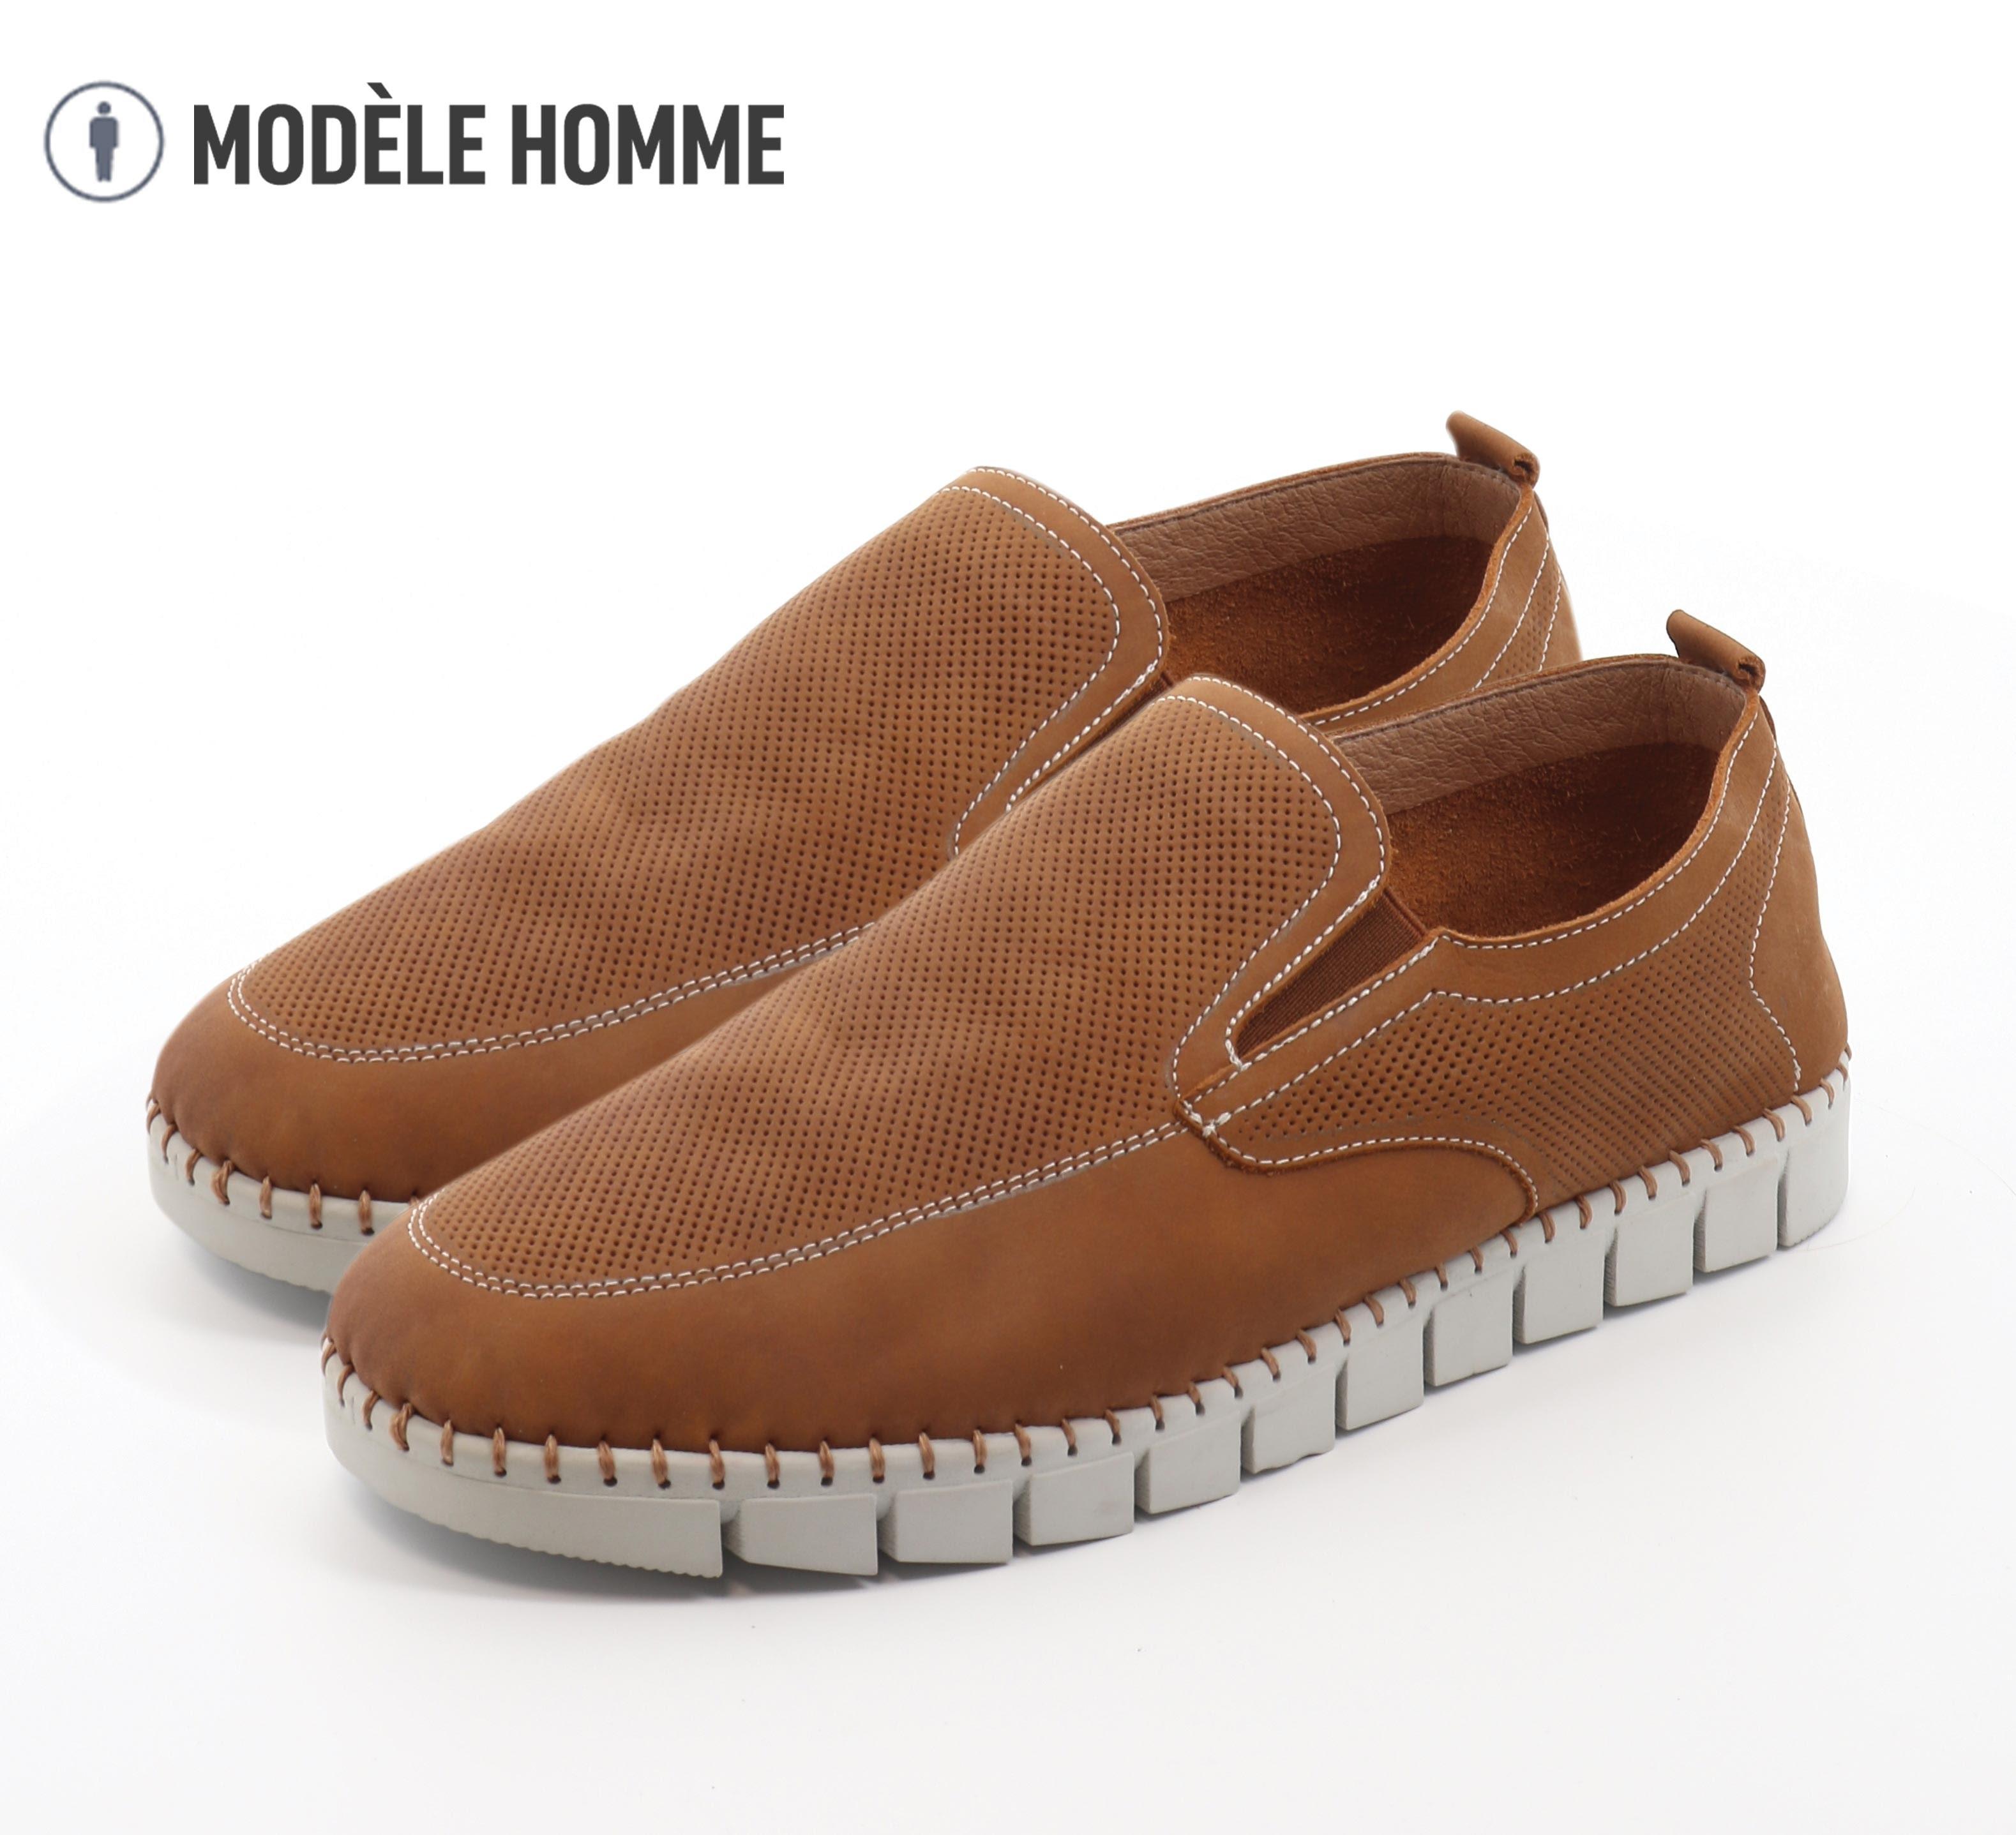 6200477106e6d9 GIBAUD Chaussures Forli Camel - Pharmacie Delepoulle